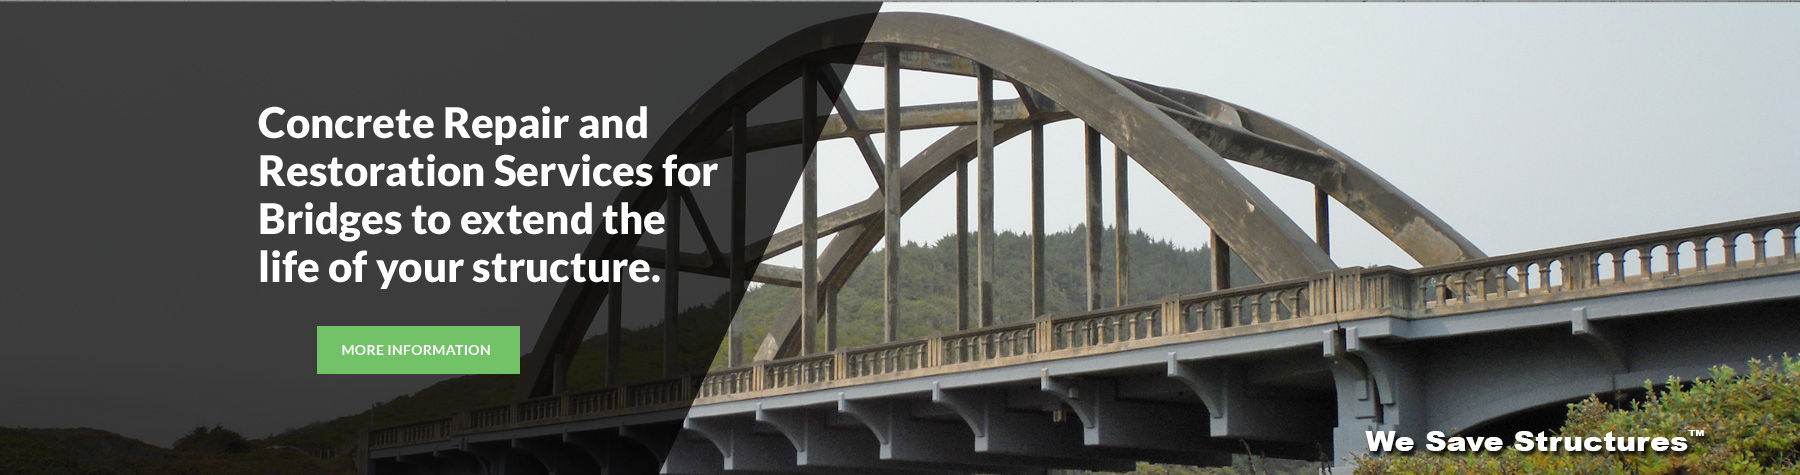 Concrete Restoration Contractors Protection Amp Repair In